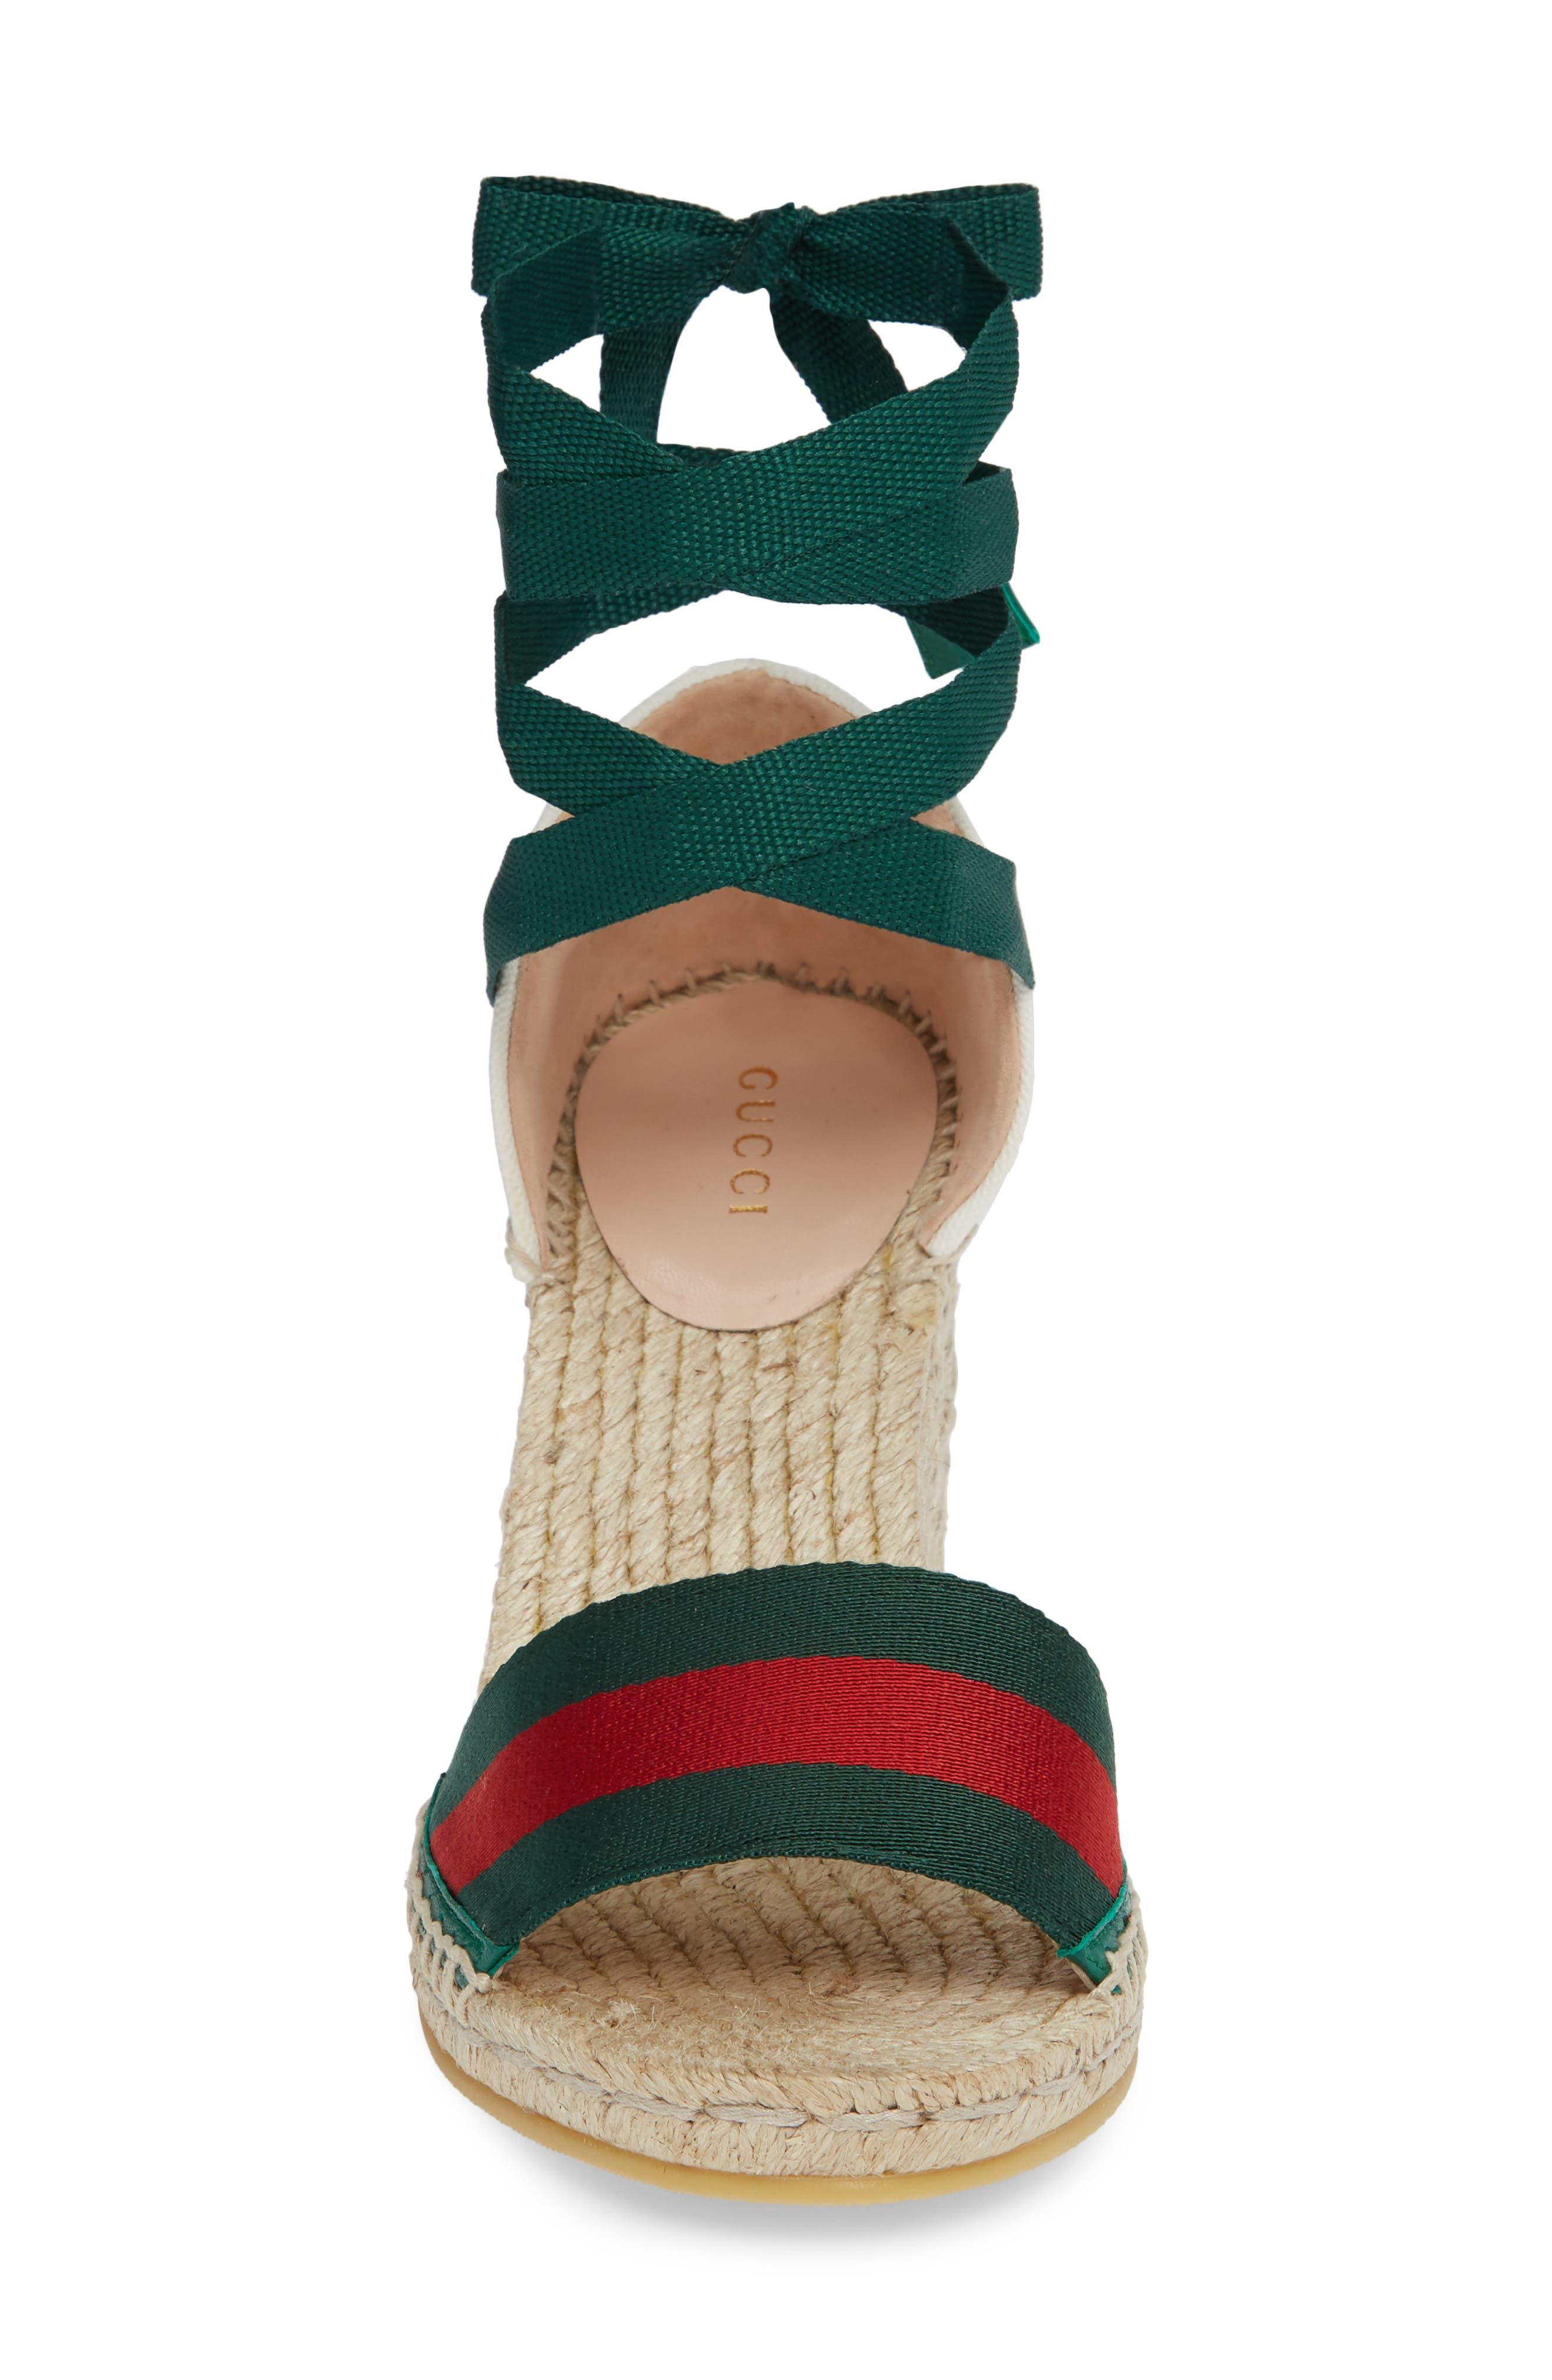 GUCCI, Lilibeth Sylvie Web Espadrille Wedge Sandal, Alternate thumbnail 4, color, WHITE/ GREEN